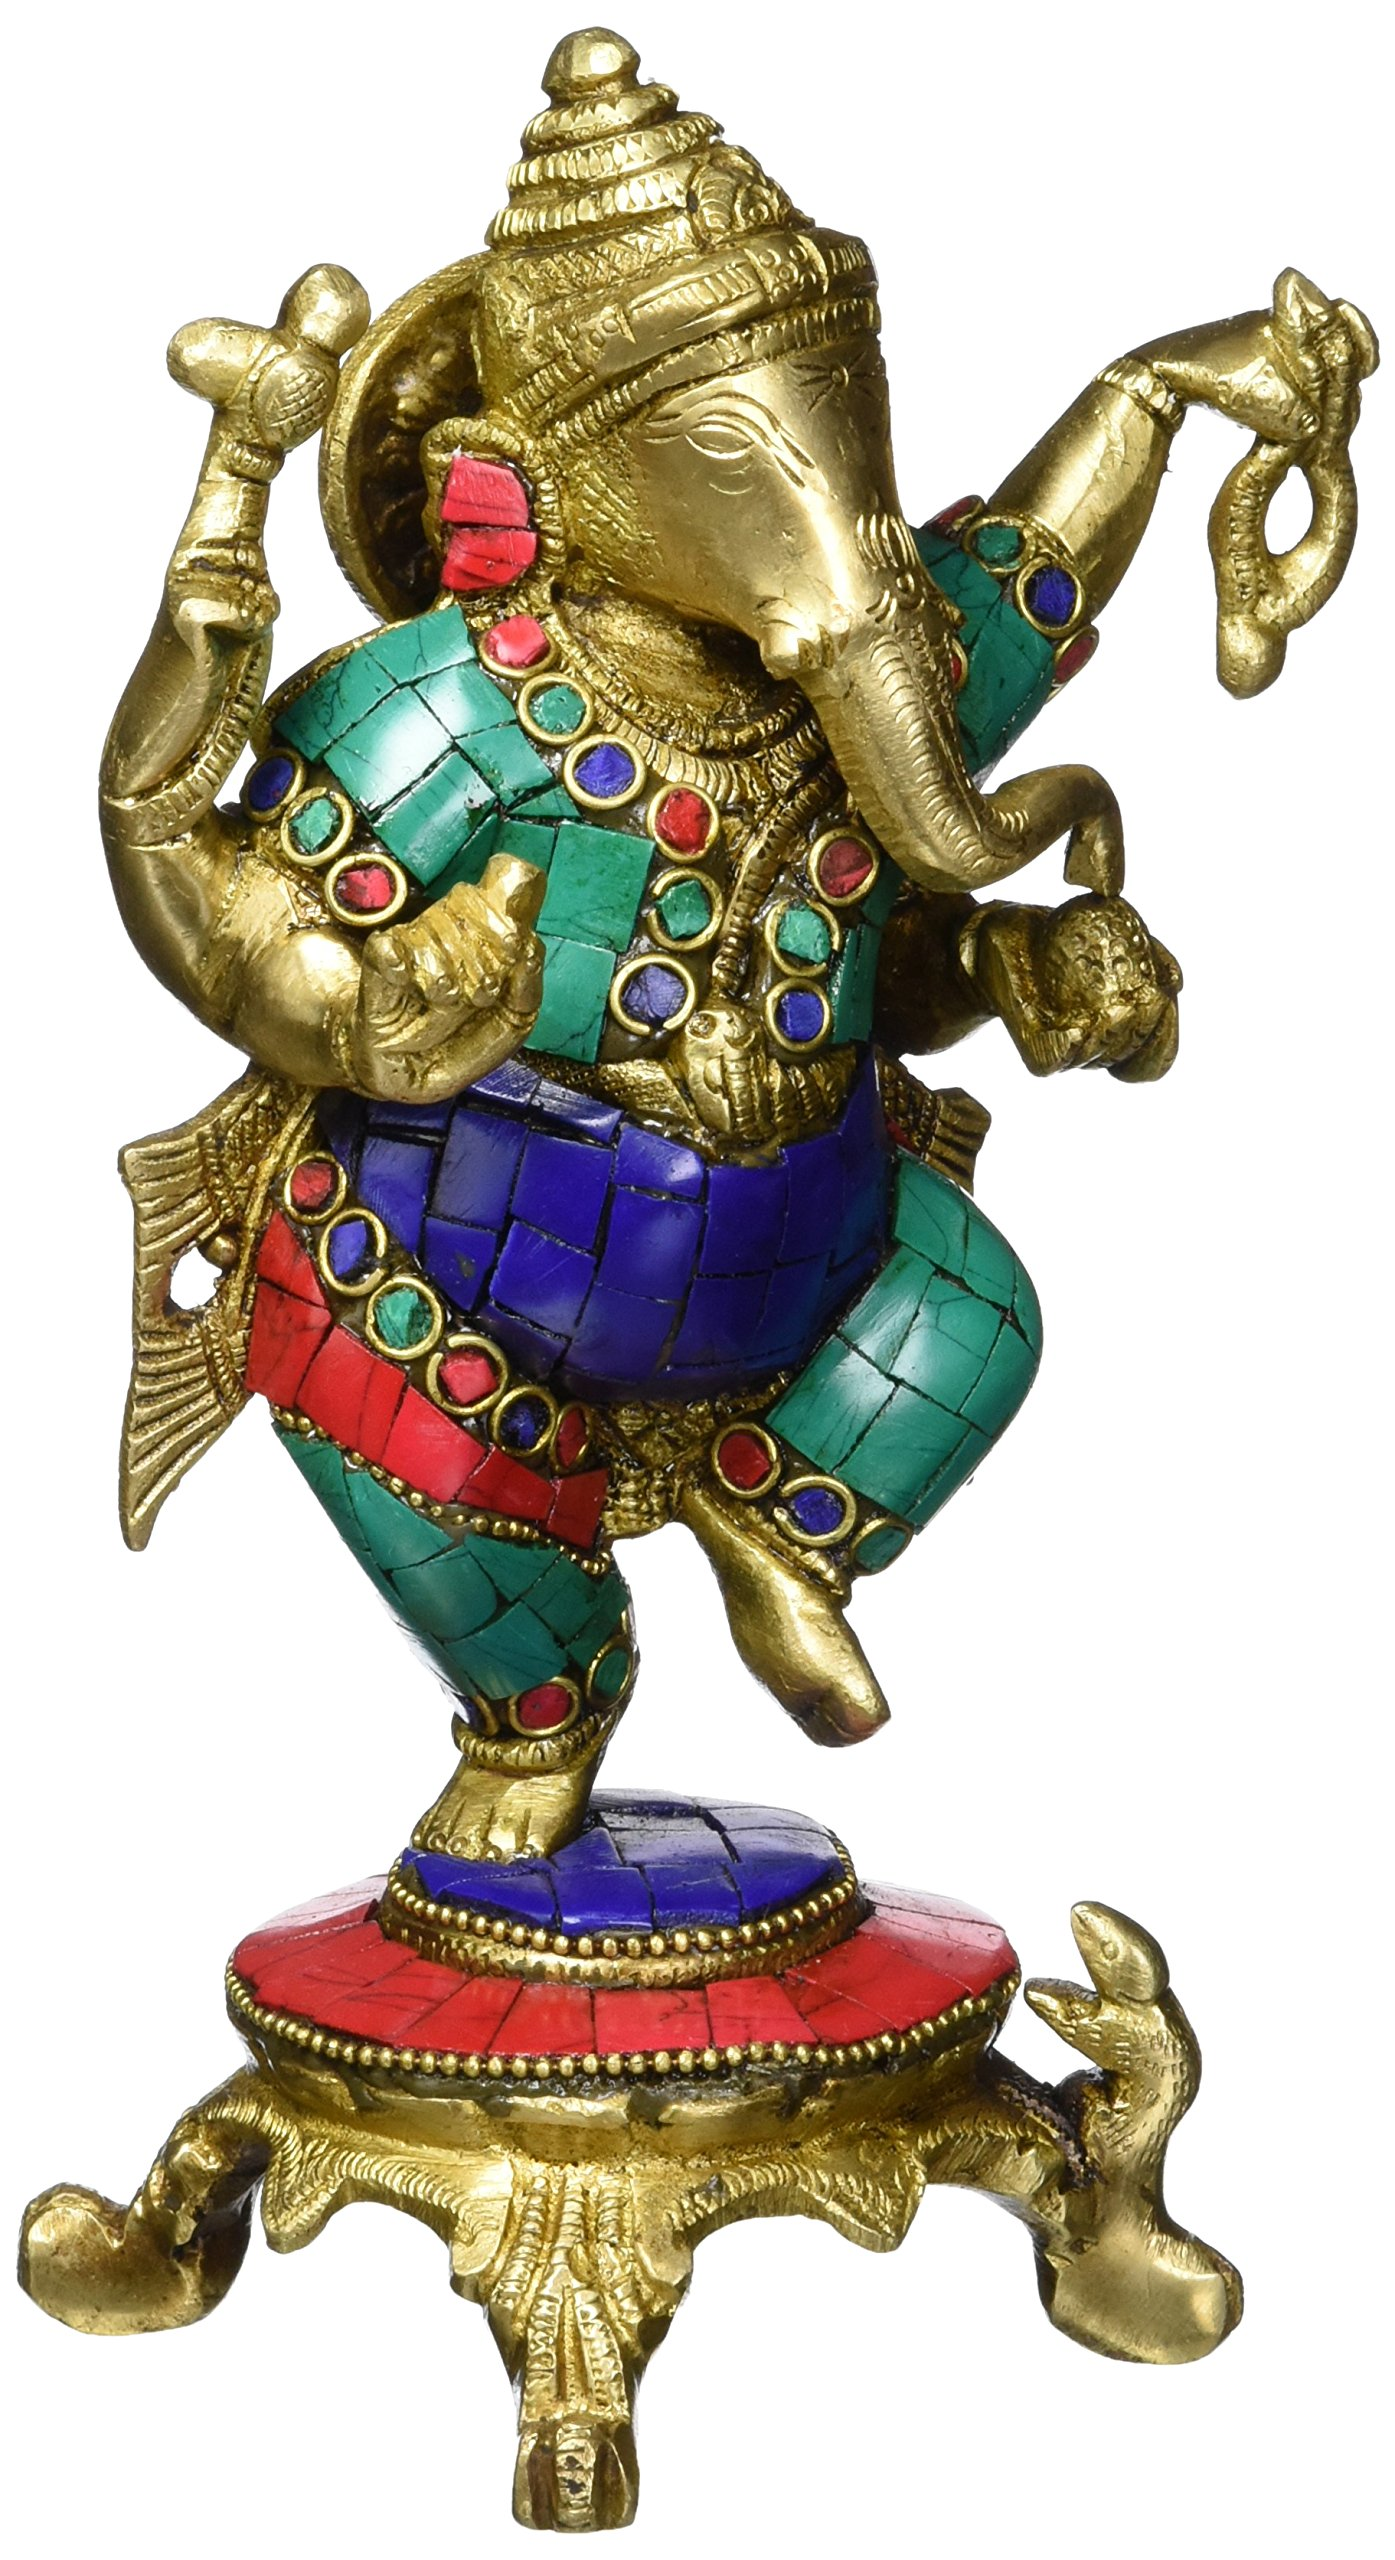 Aone India 8'' Dancing Lord Ganesh Shiva Statue- Brass Bronze Turquoise Handwork Hindu Good Luck God Figurine Xmas Gift + Cash Envelope (Pack Of 10)